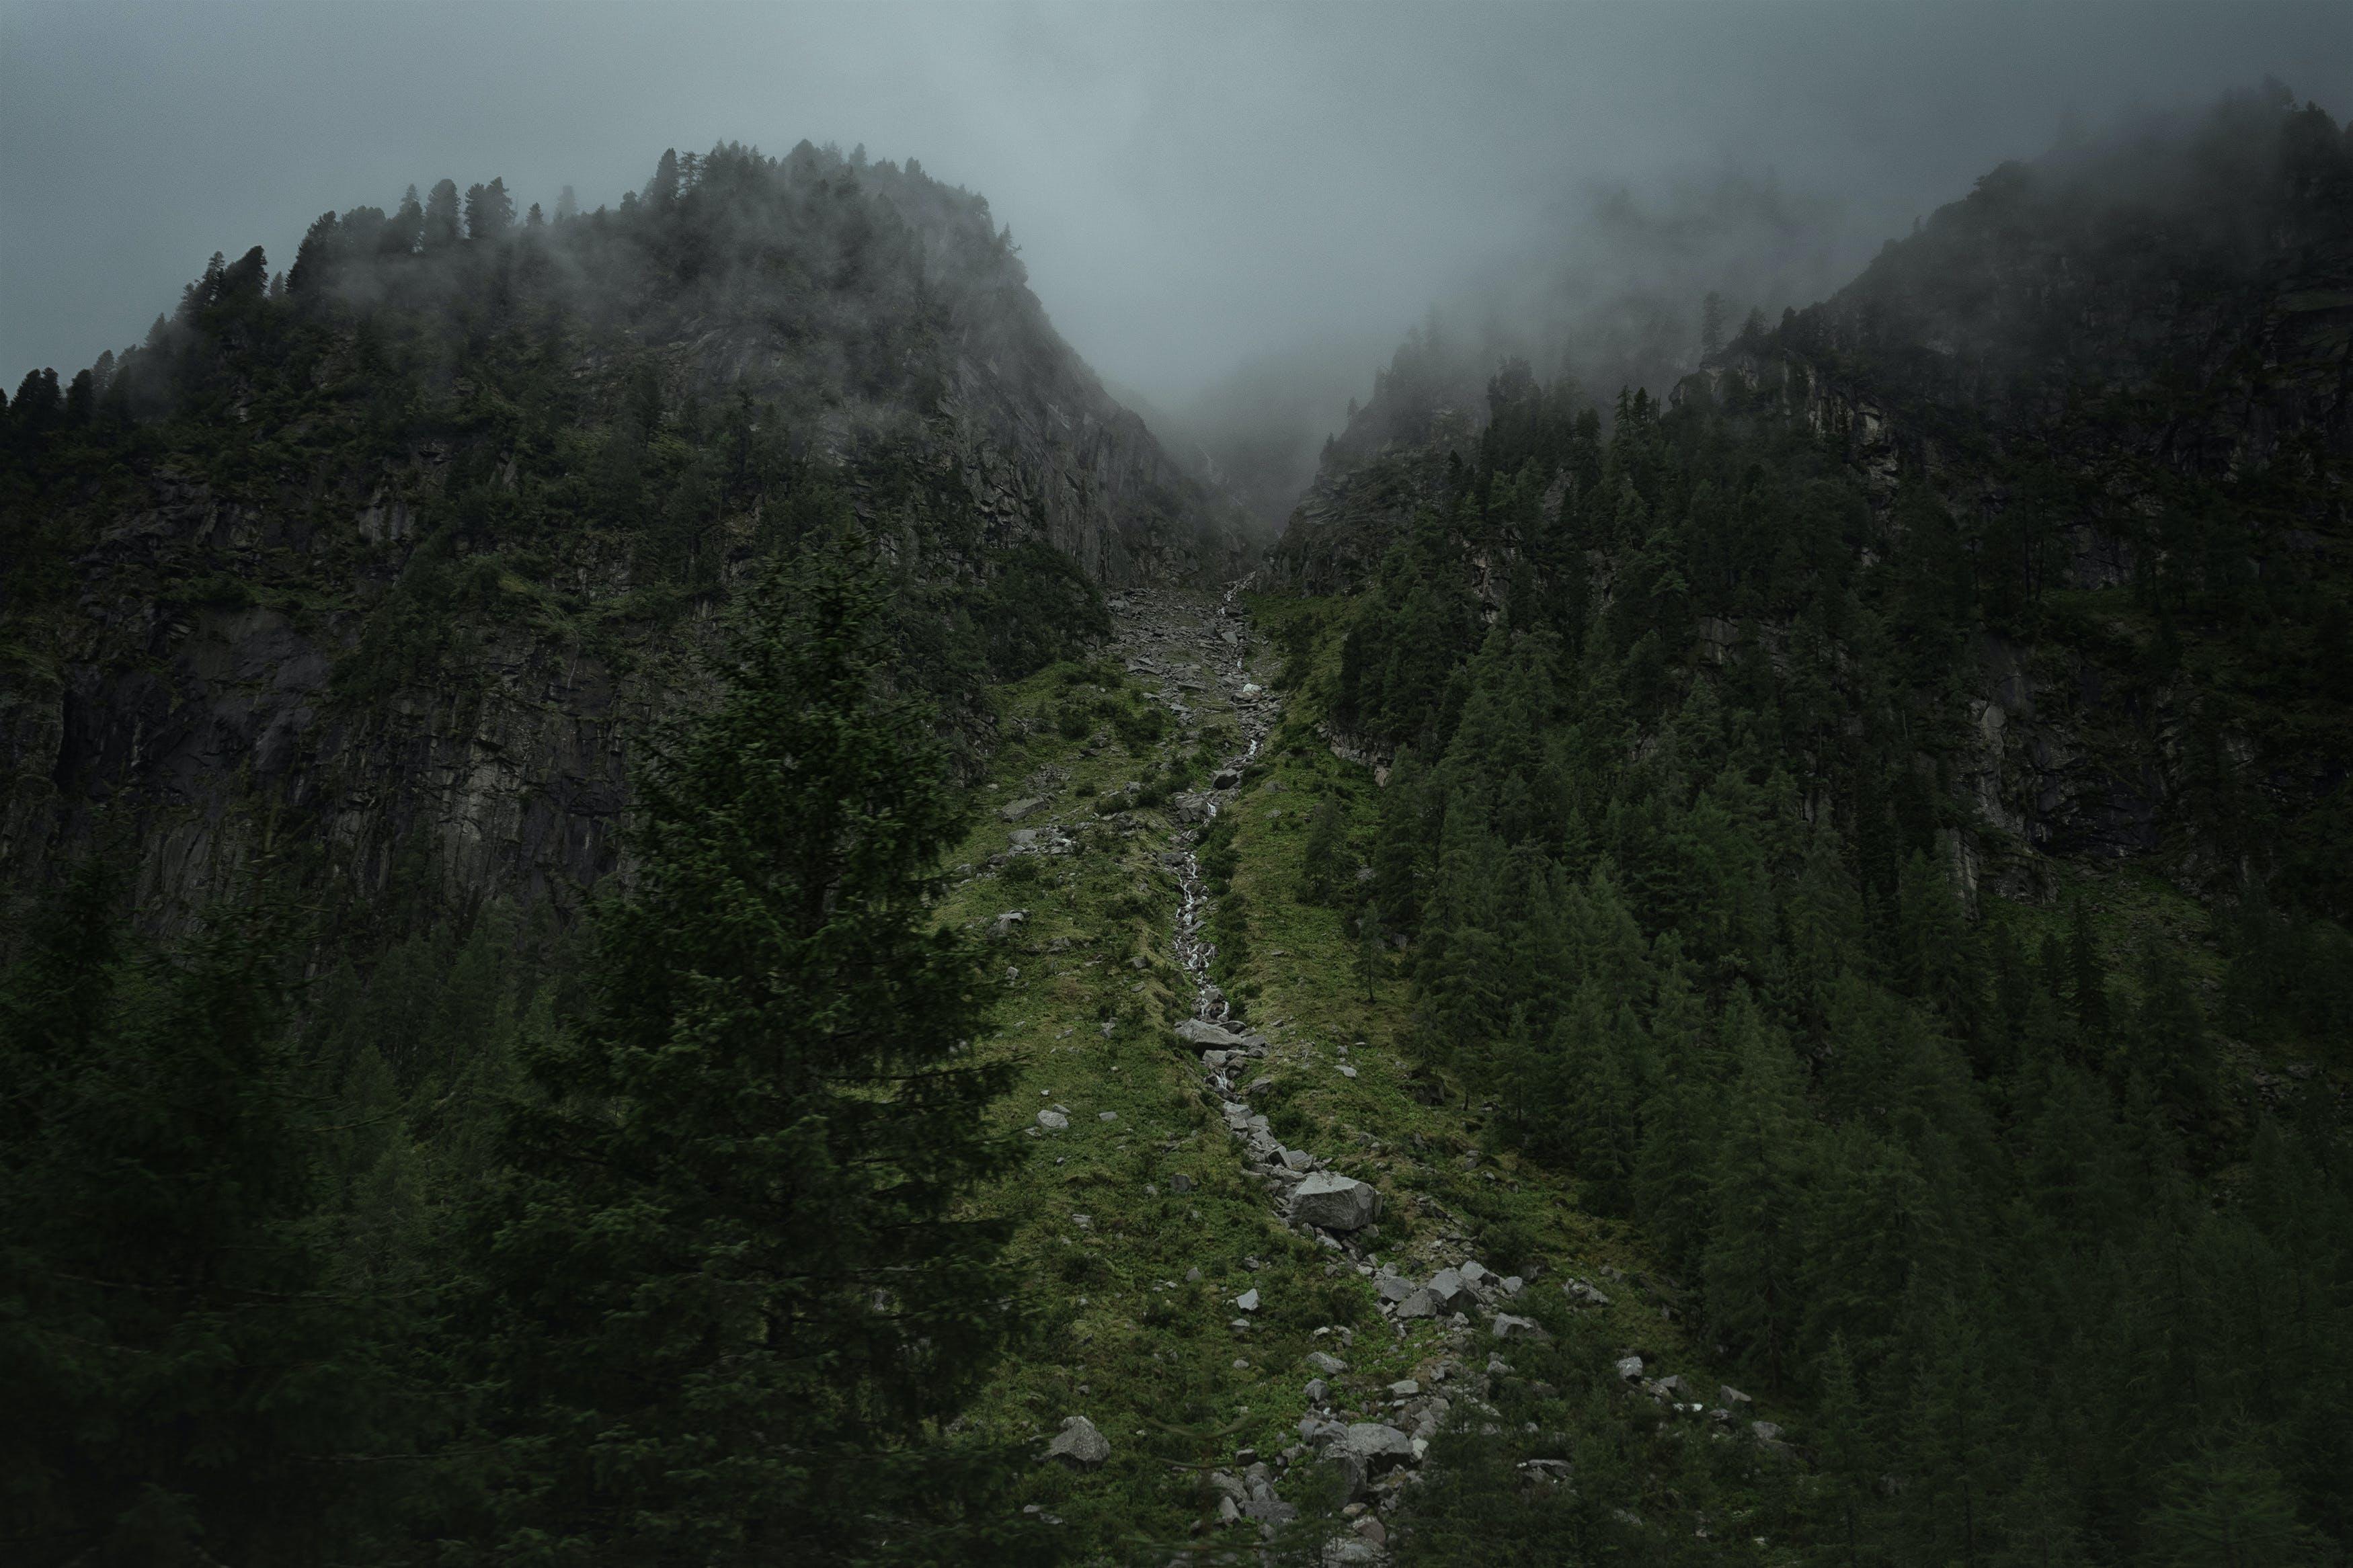 View of Landslide